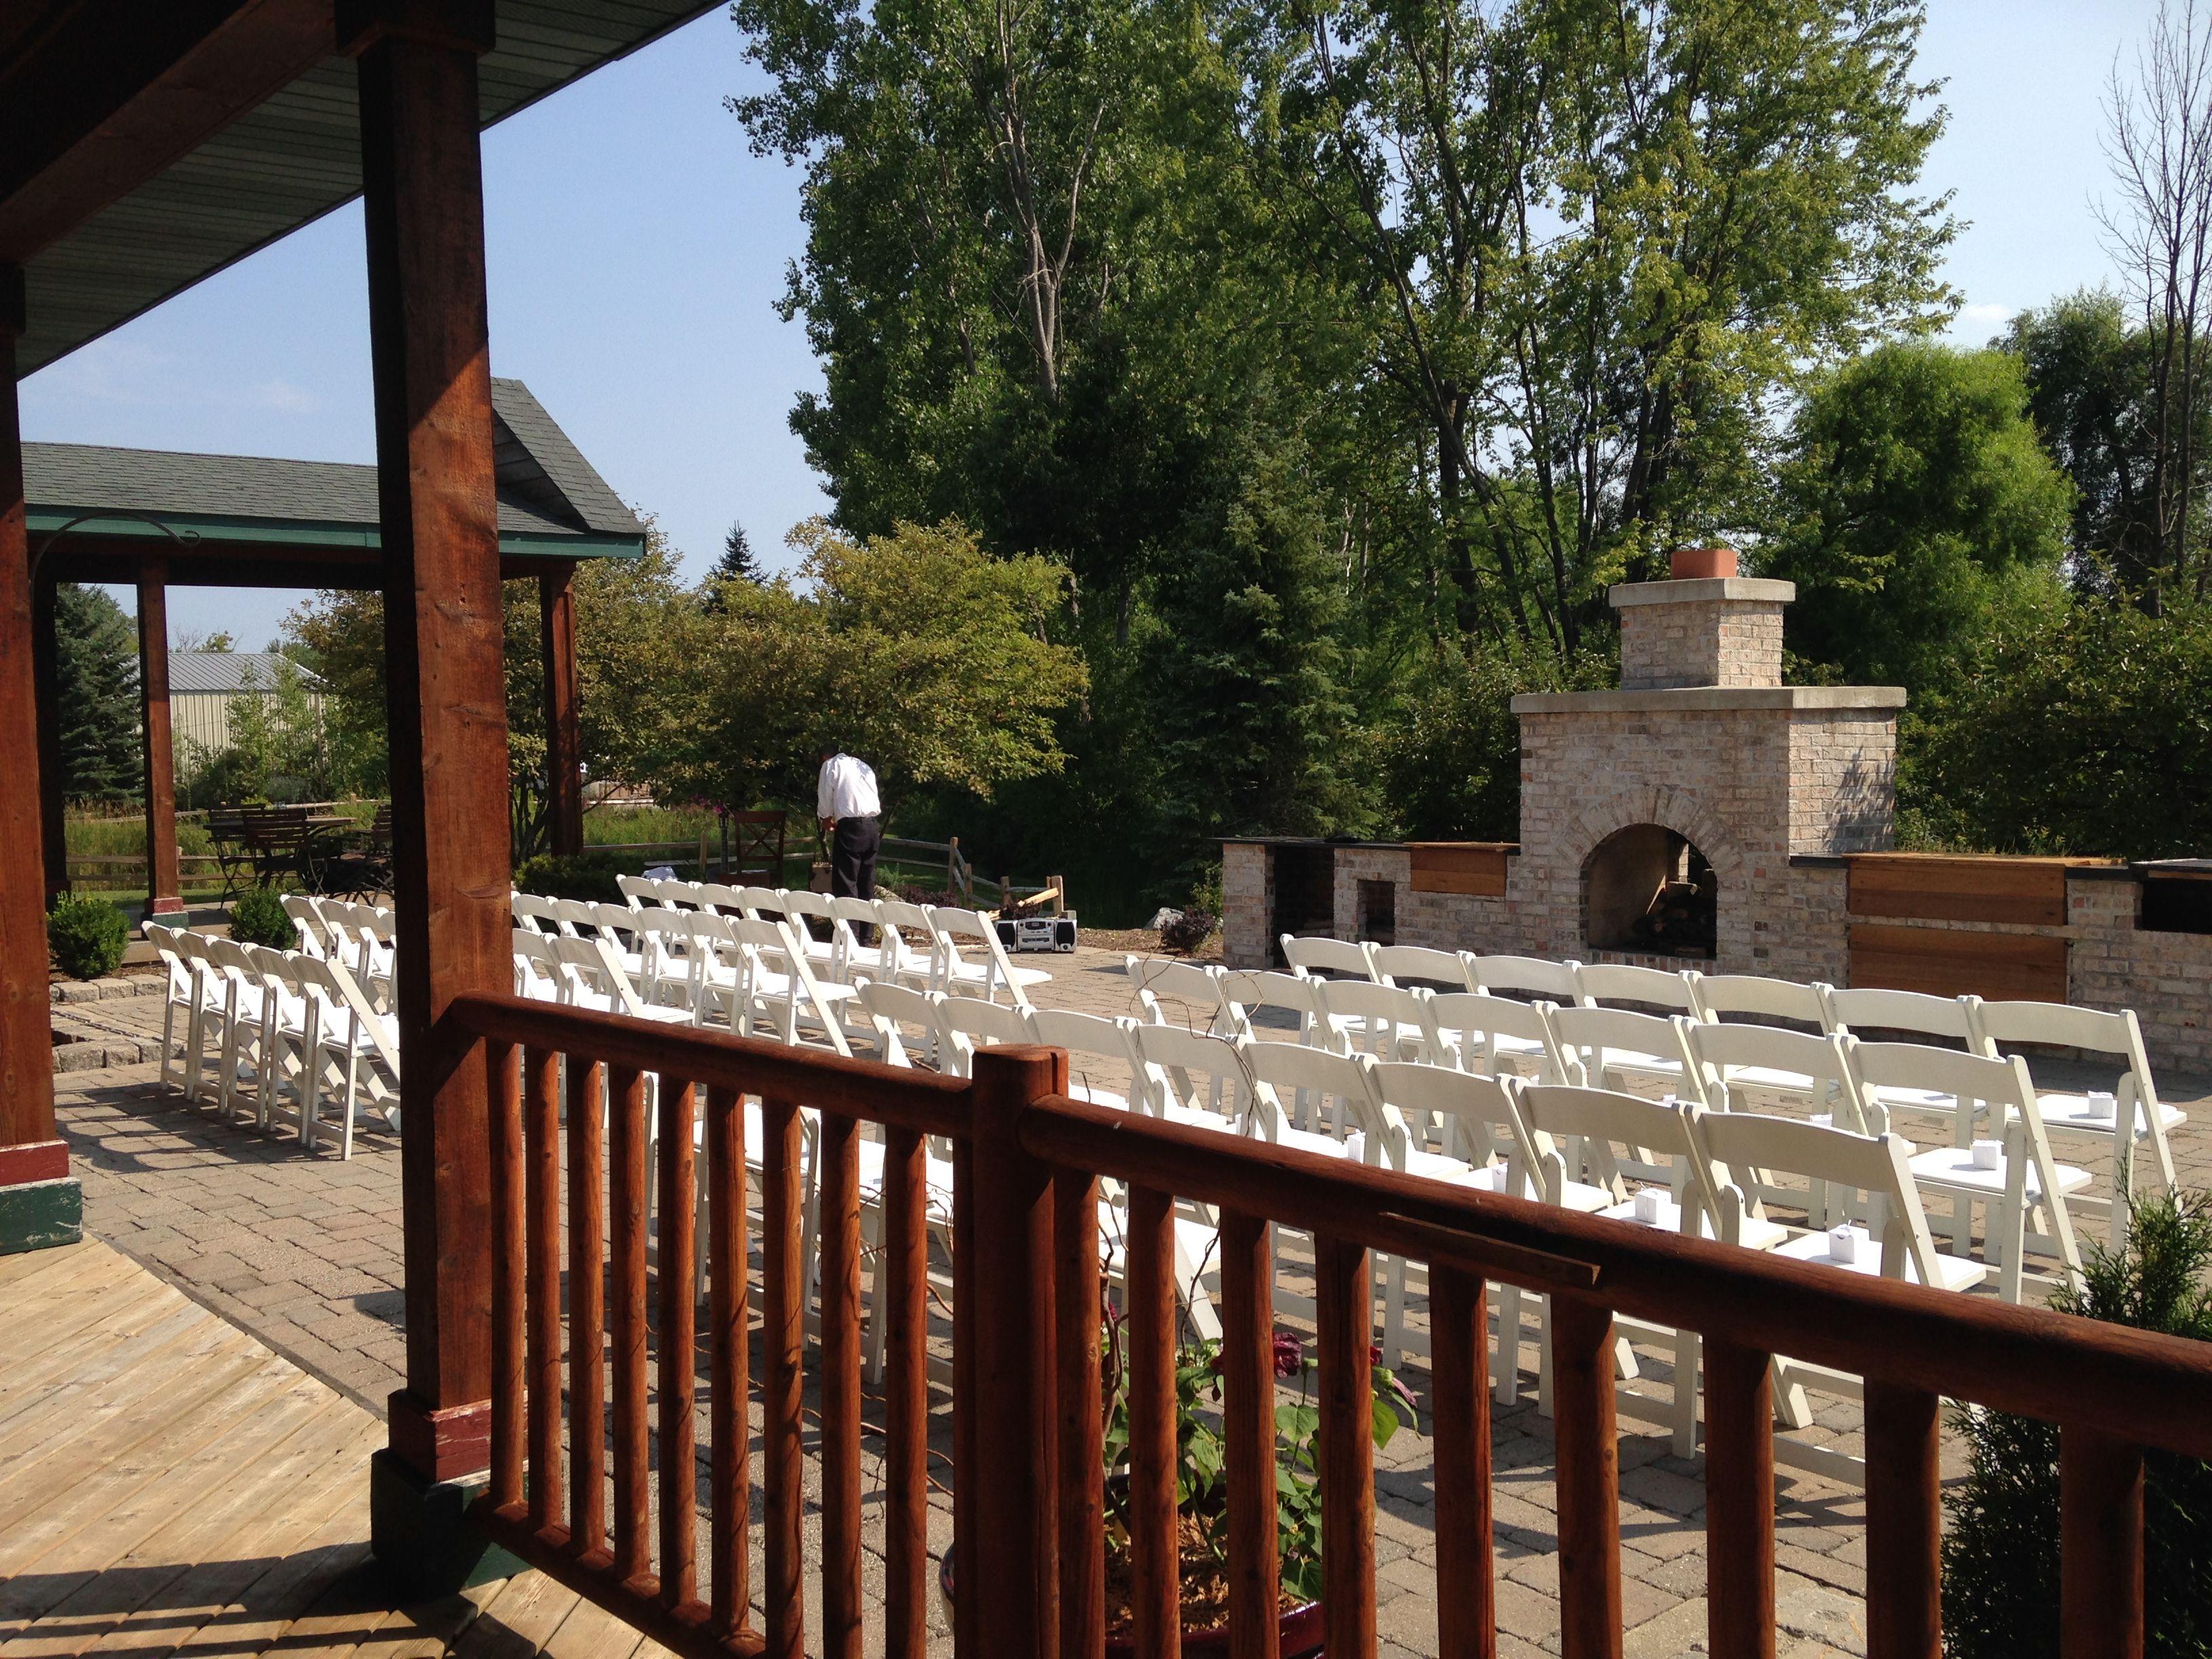 Banquets - | Michigan wedding venues, Rustic wedding ...